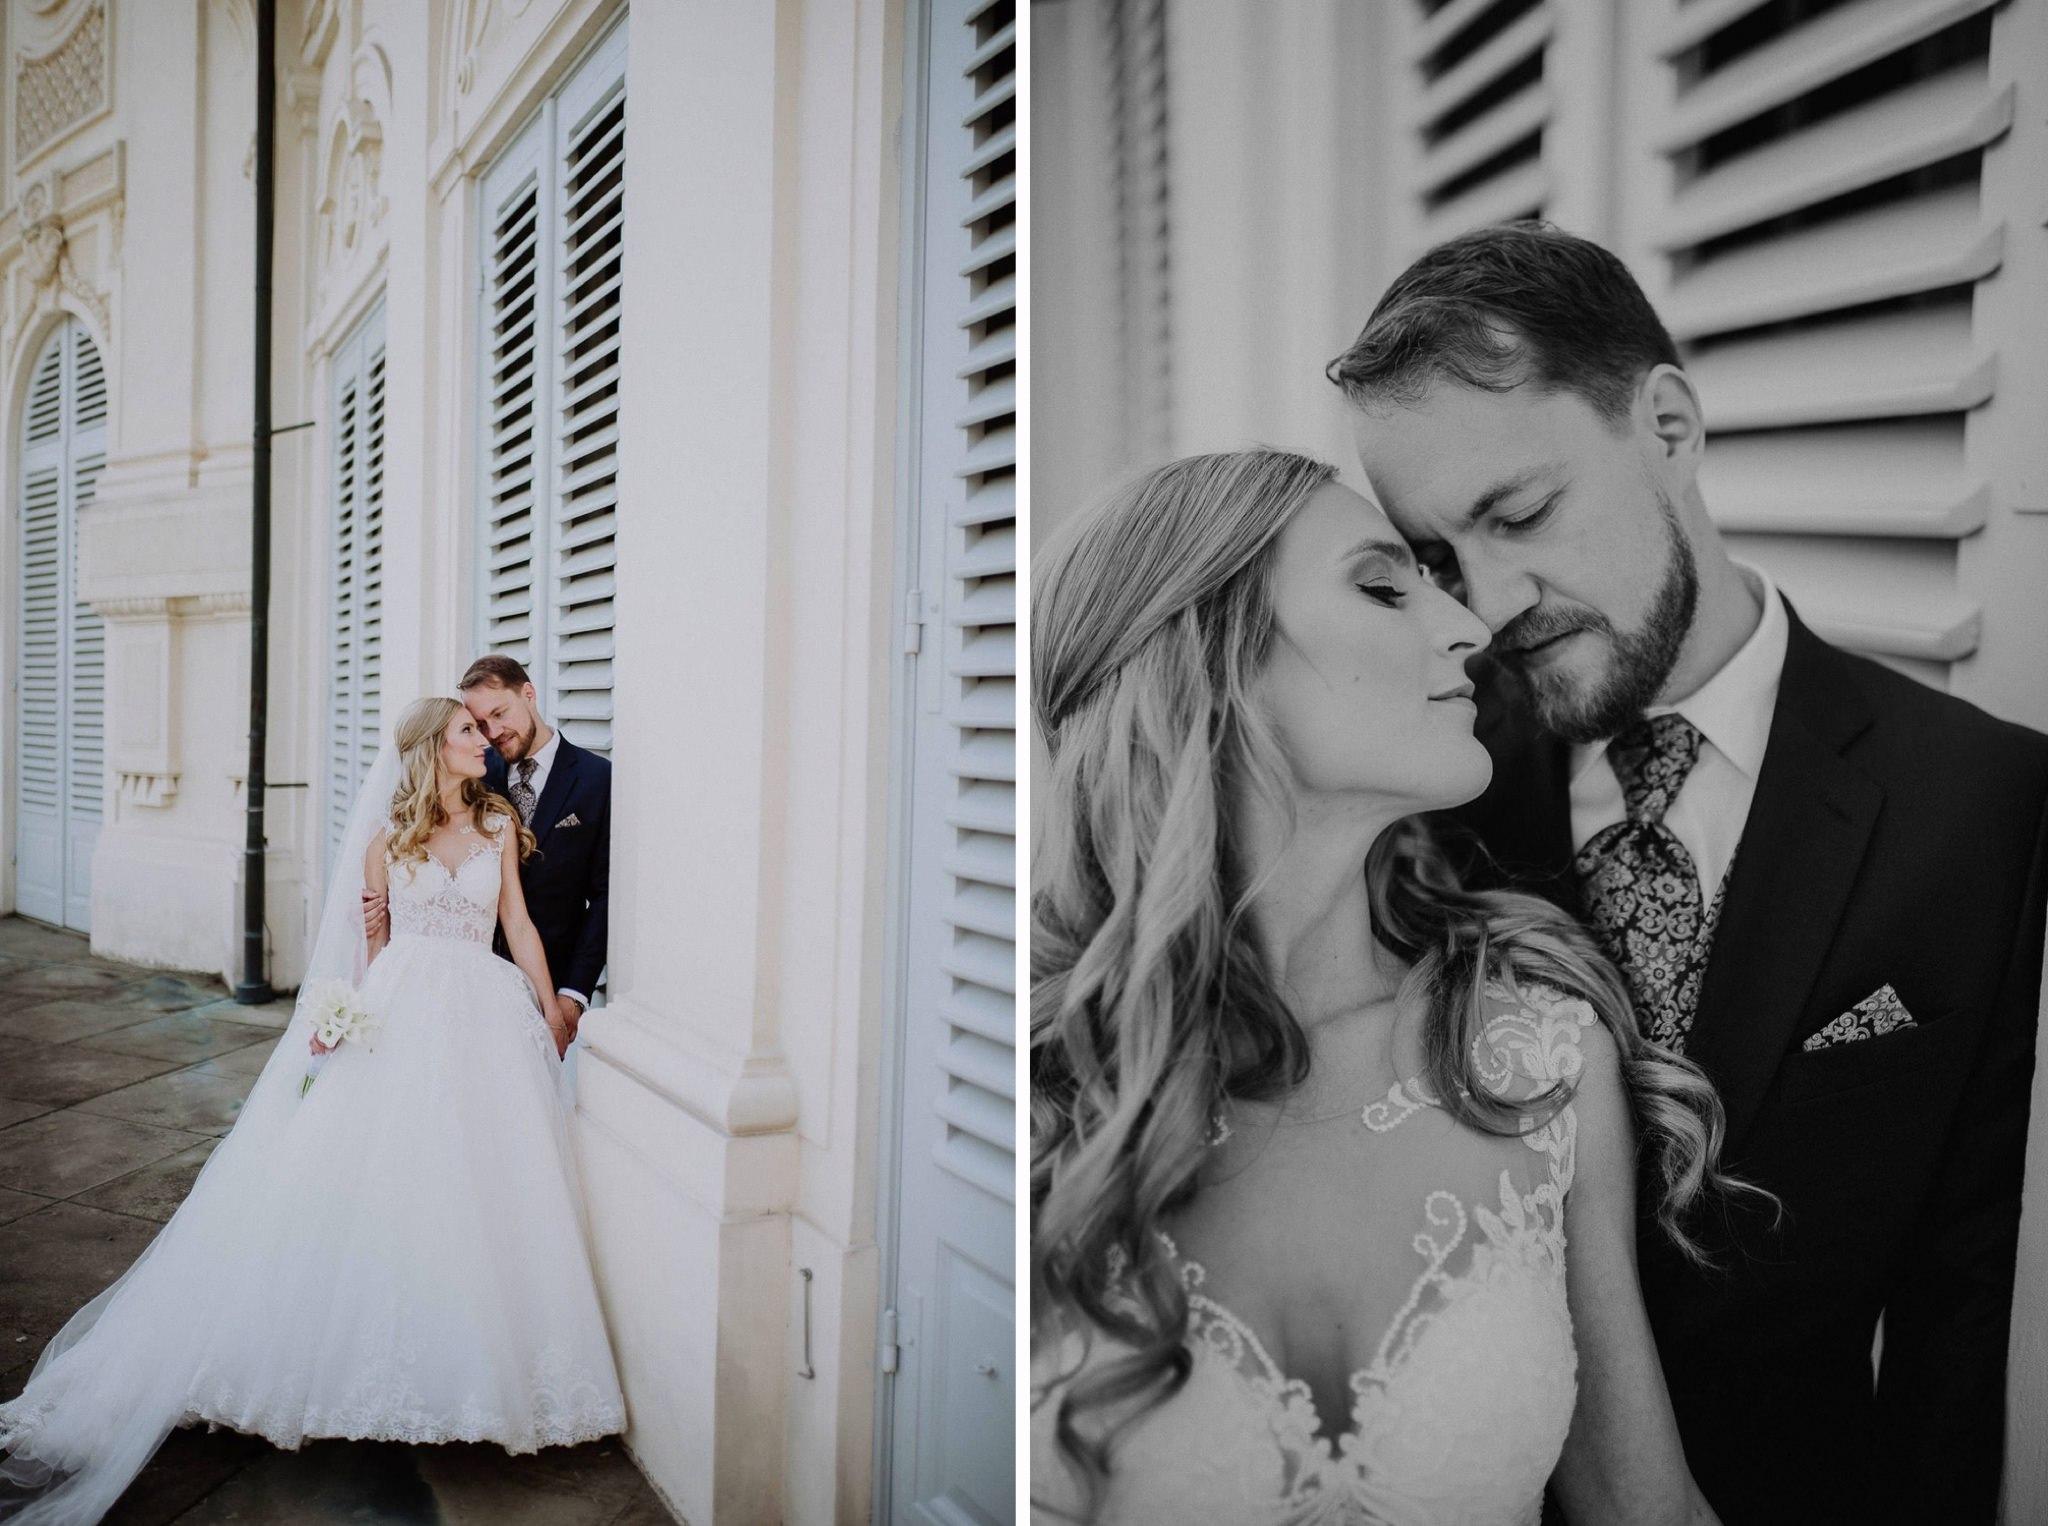 wedding photographer hamilton new zealand 1017 2